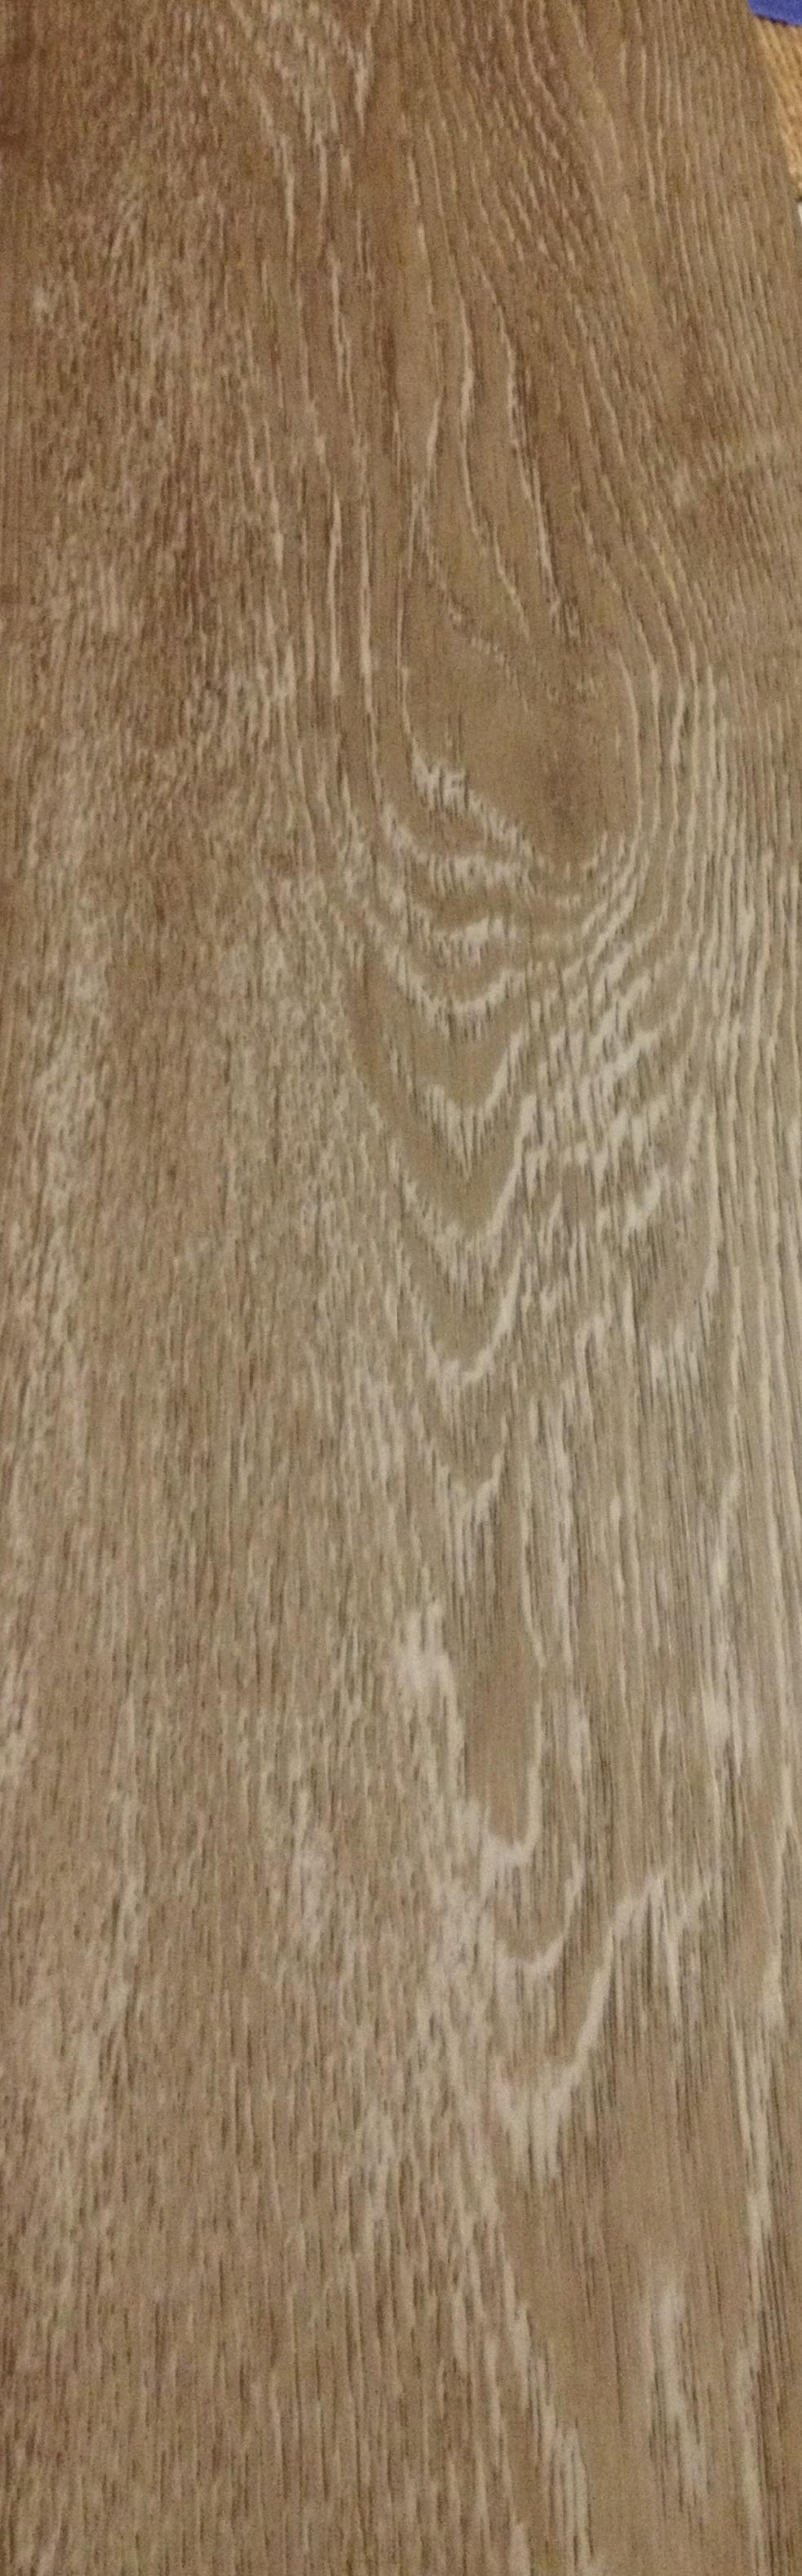 Luxury Vinyl Tile Plank Hybrids SS Flooring Installations Inc - Happy feet laminate flooring